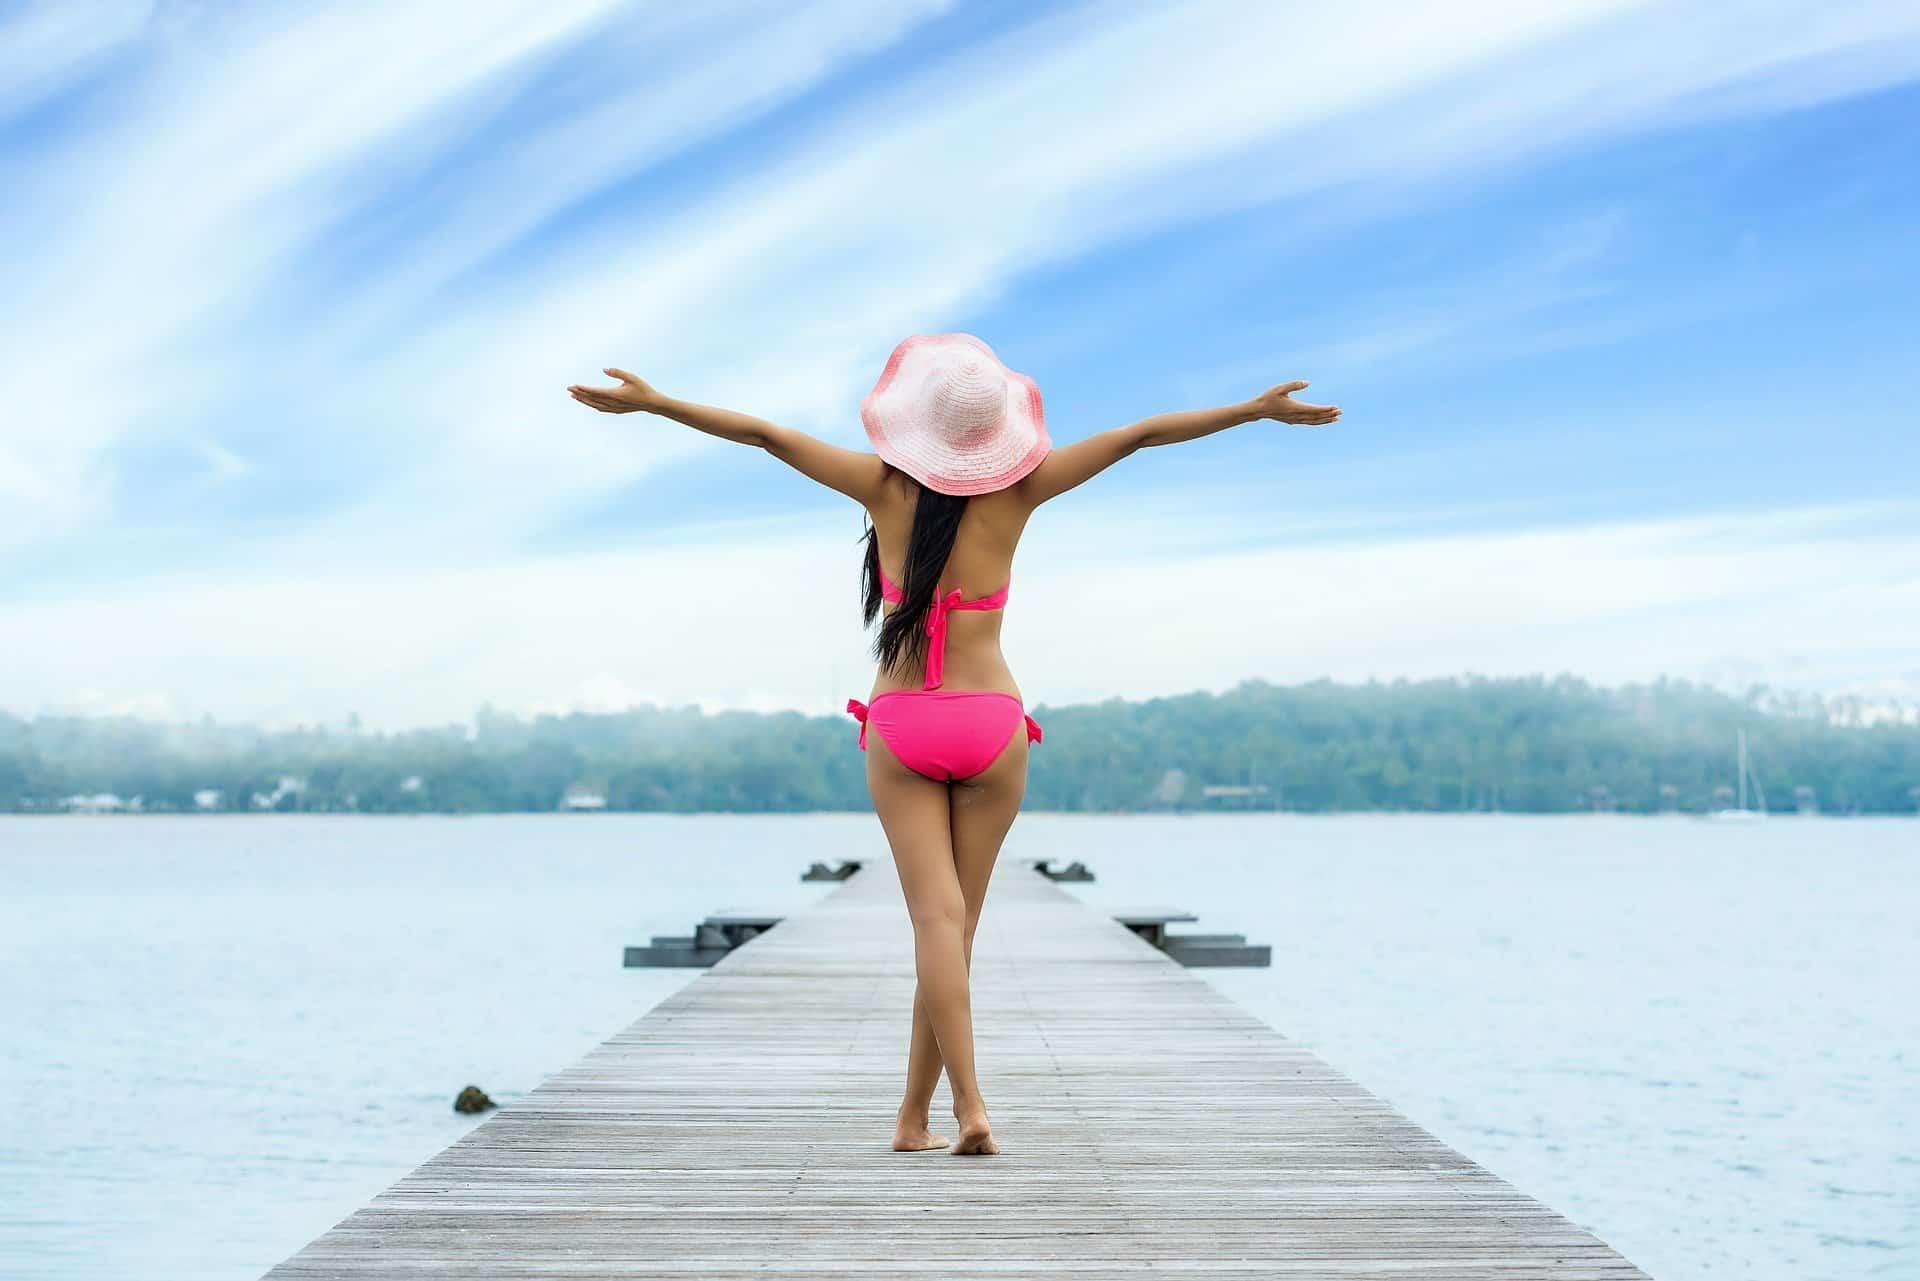 Bikinifigur bekommen - Mit Ernährung, Fitness & Motivation